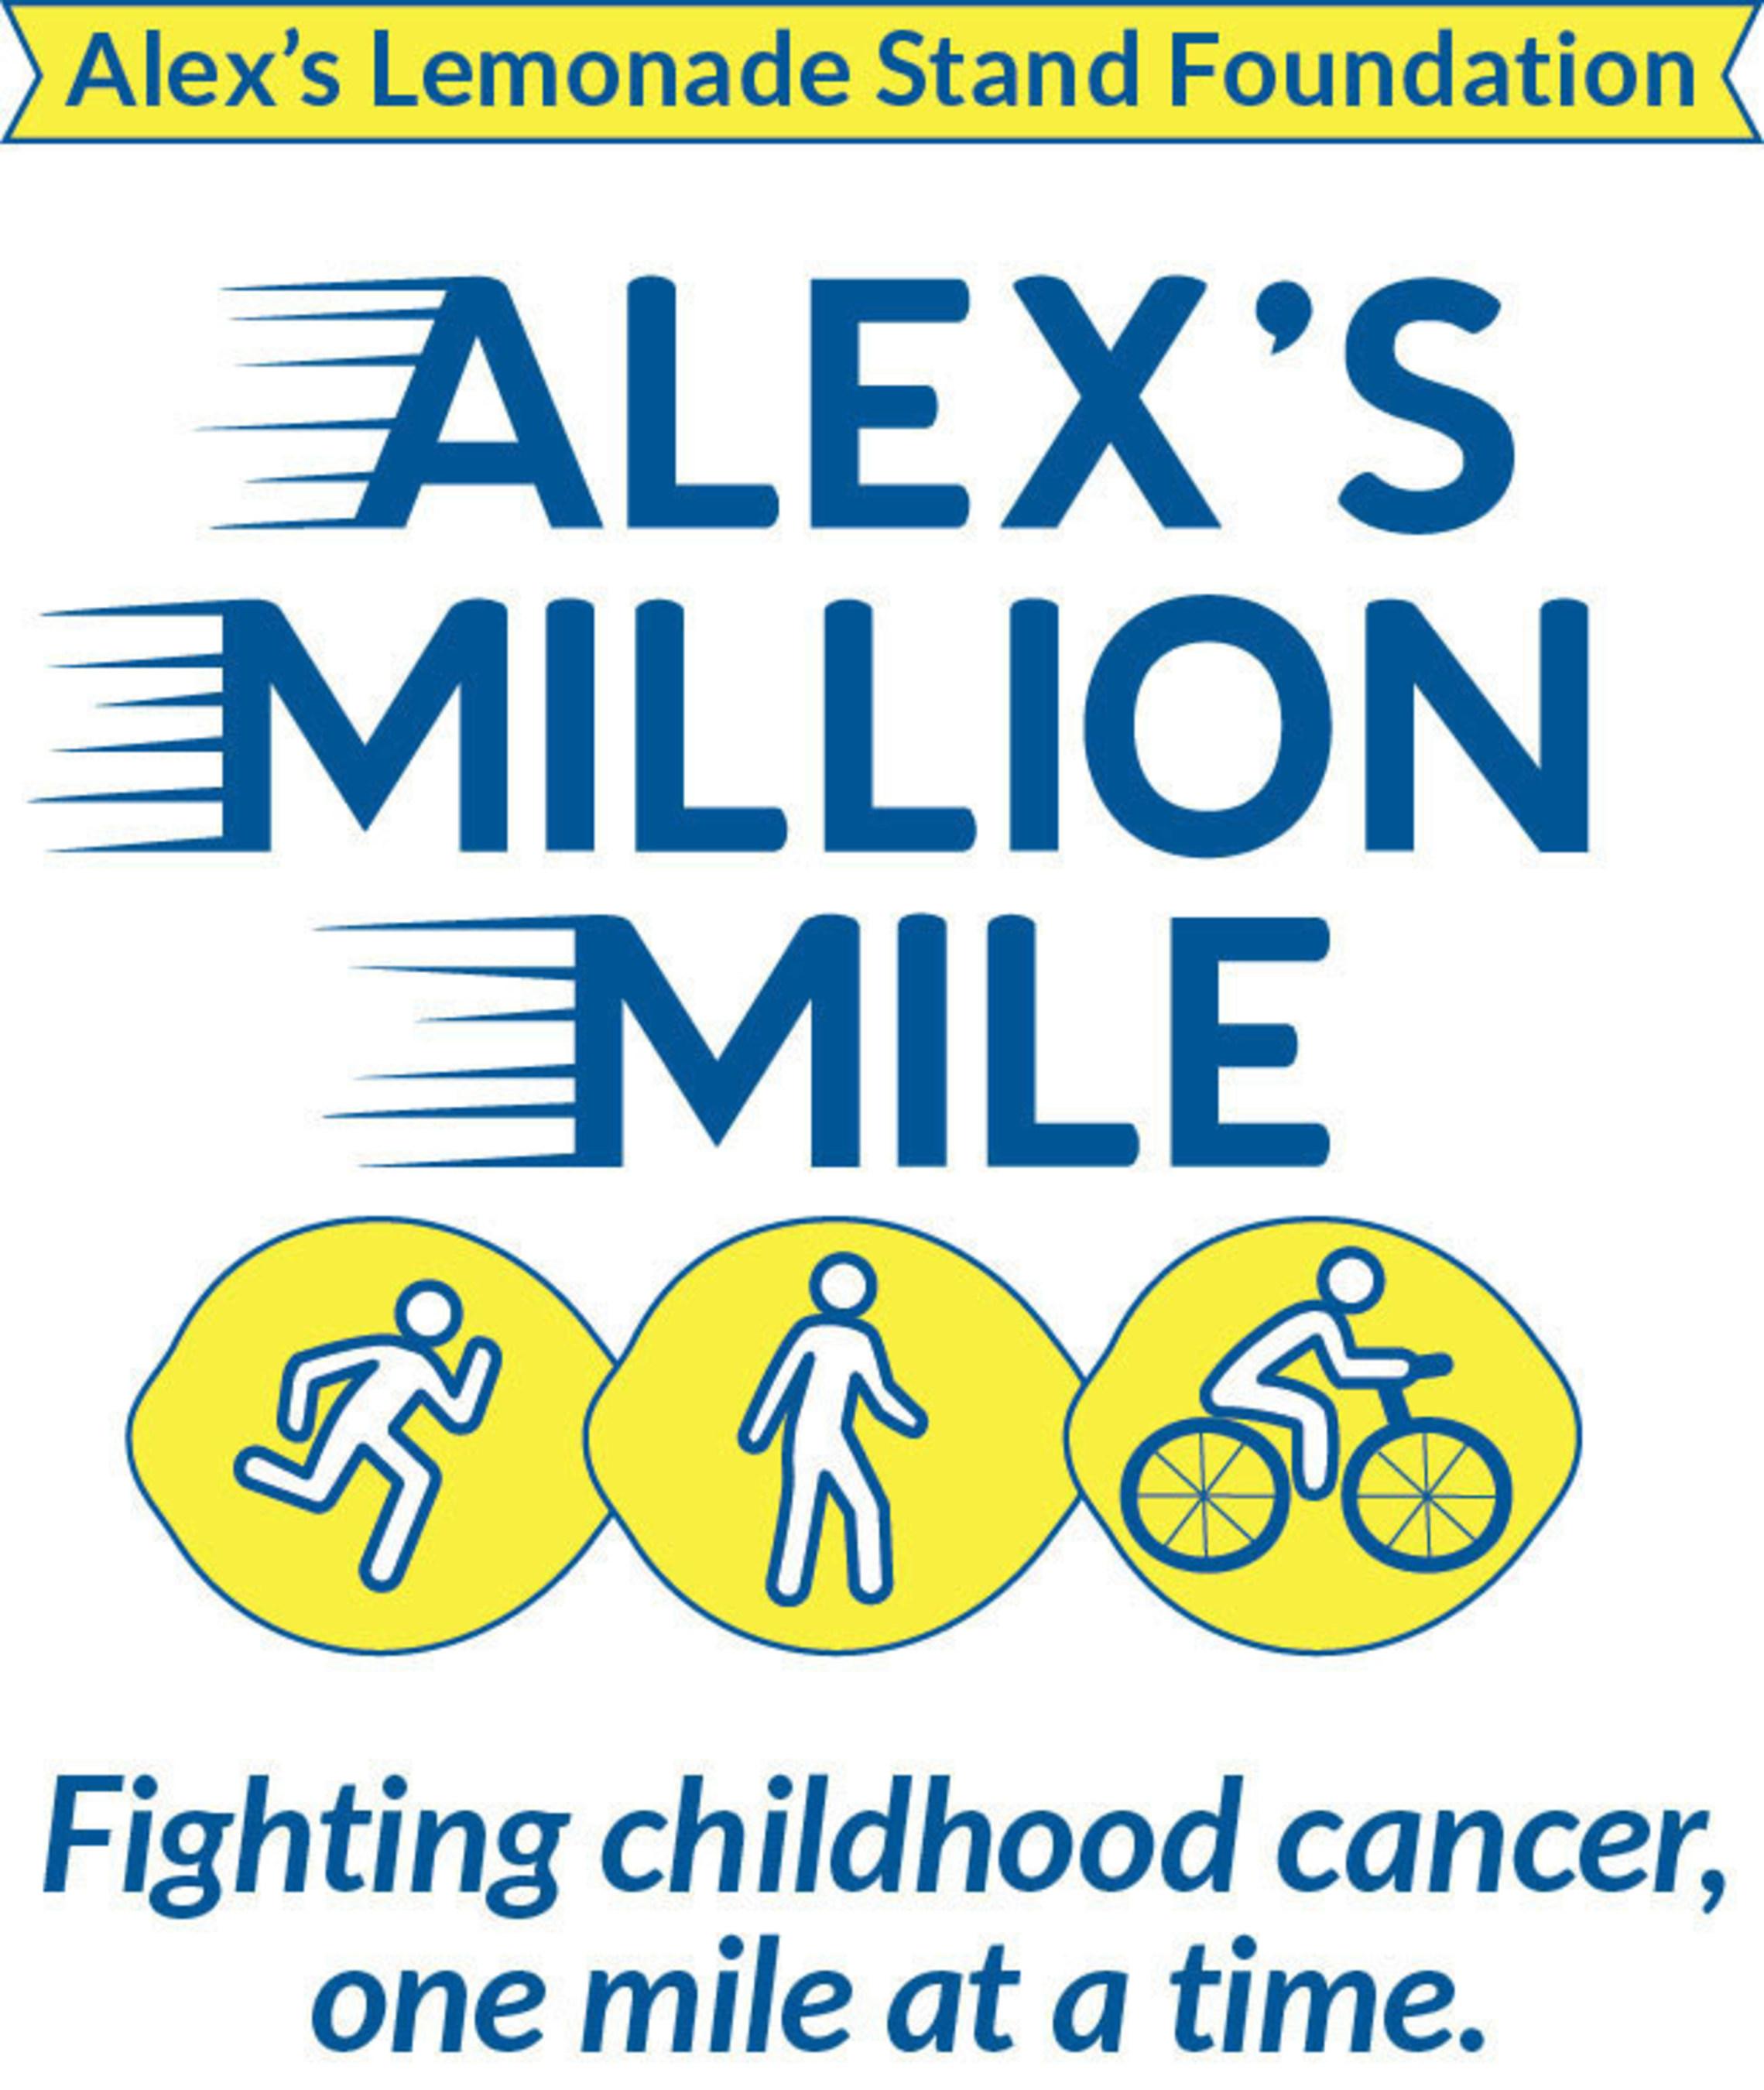 Alex's Million Mile - Run. Walk. Ride.